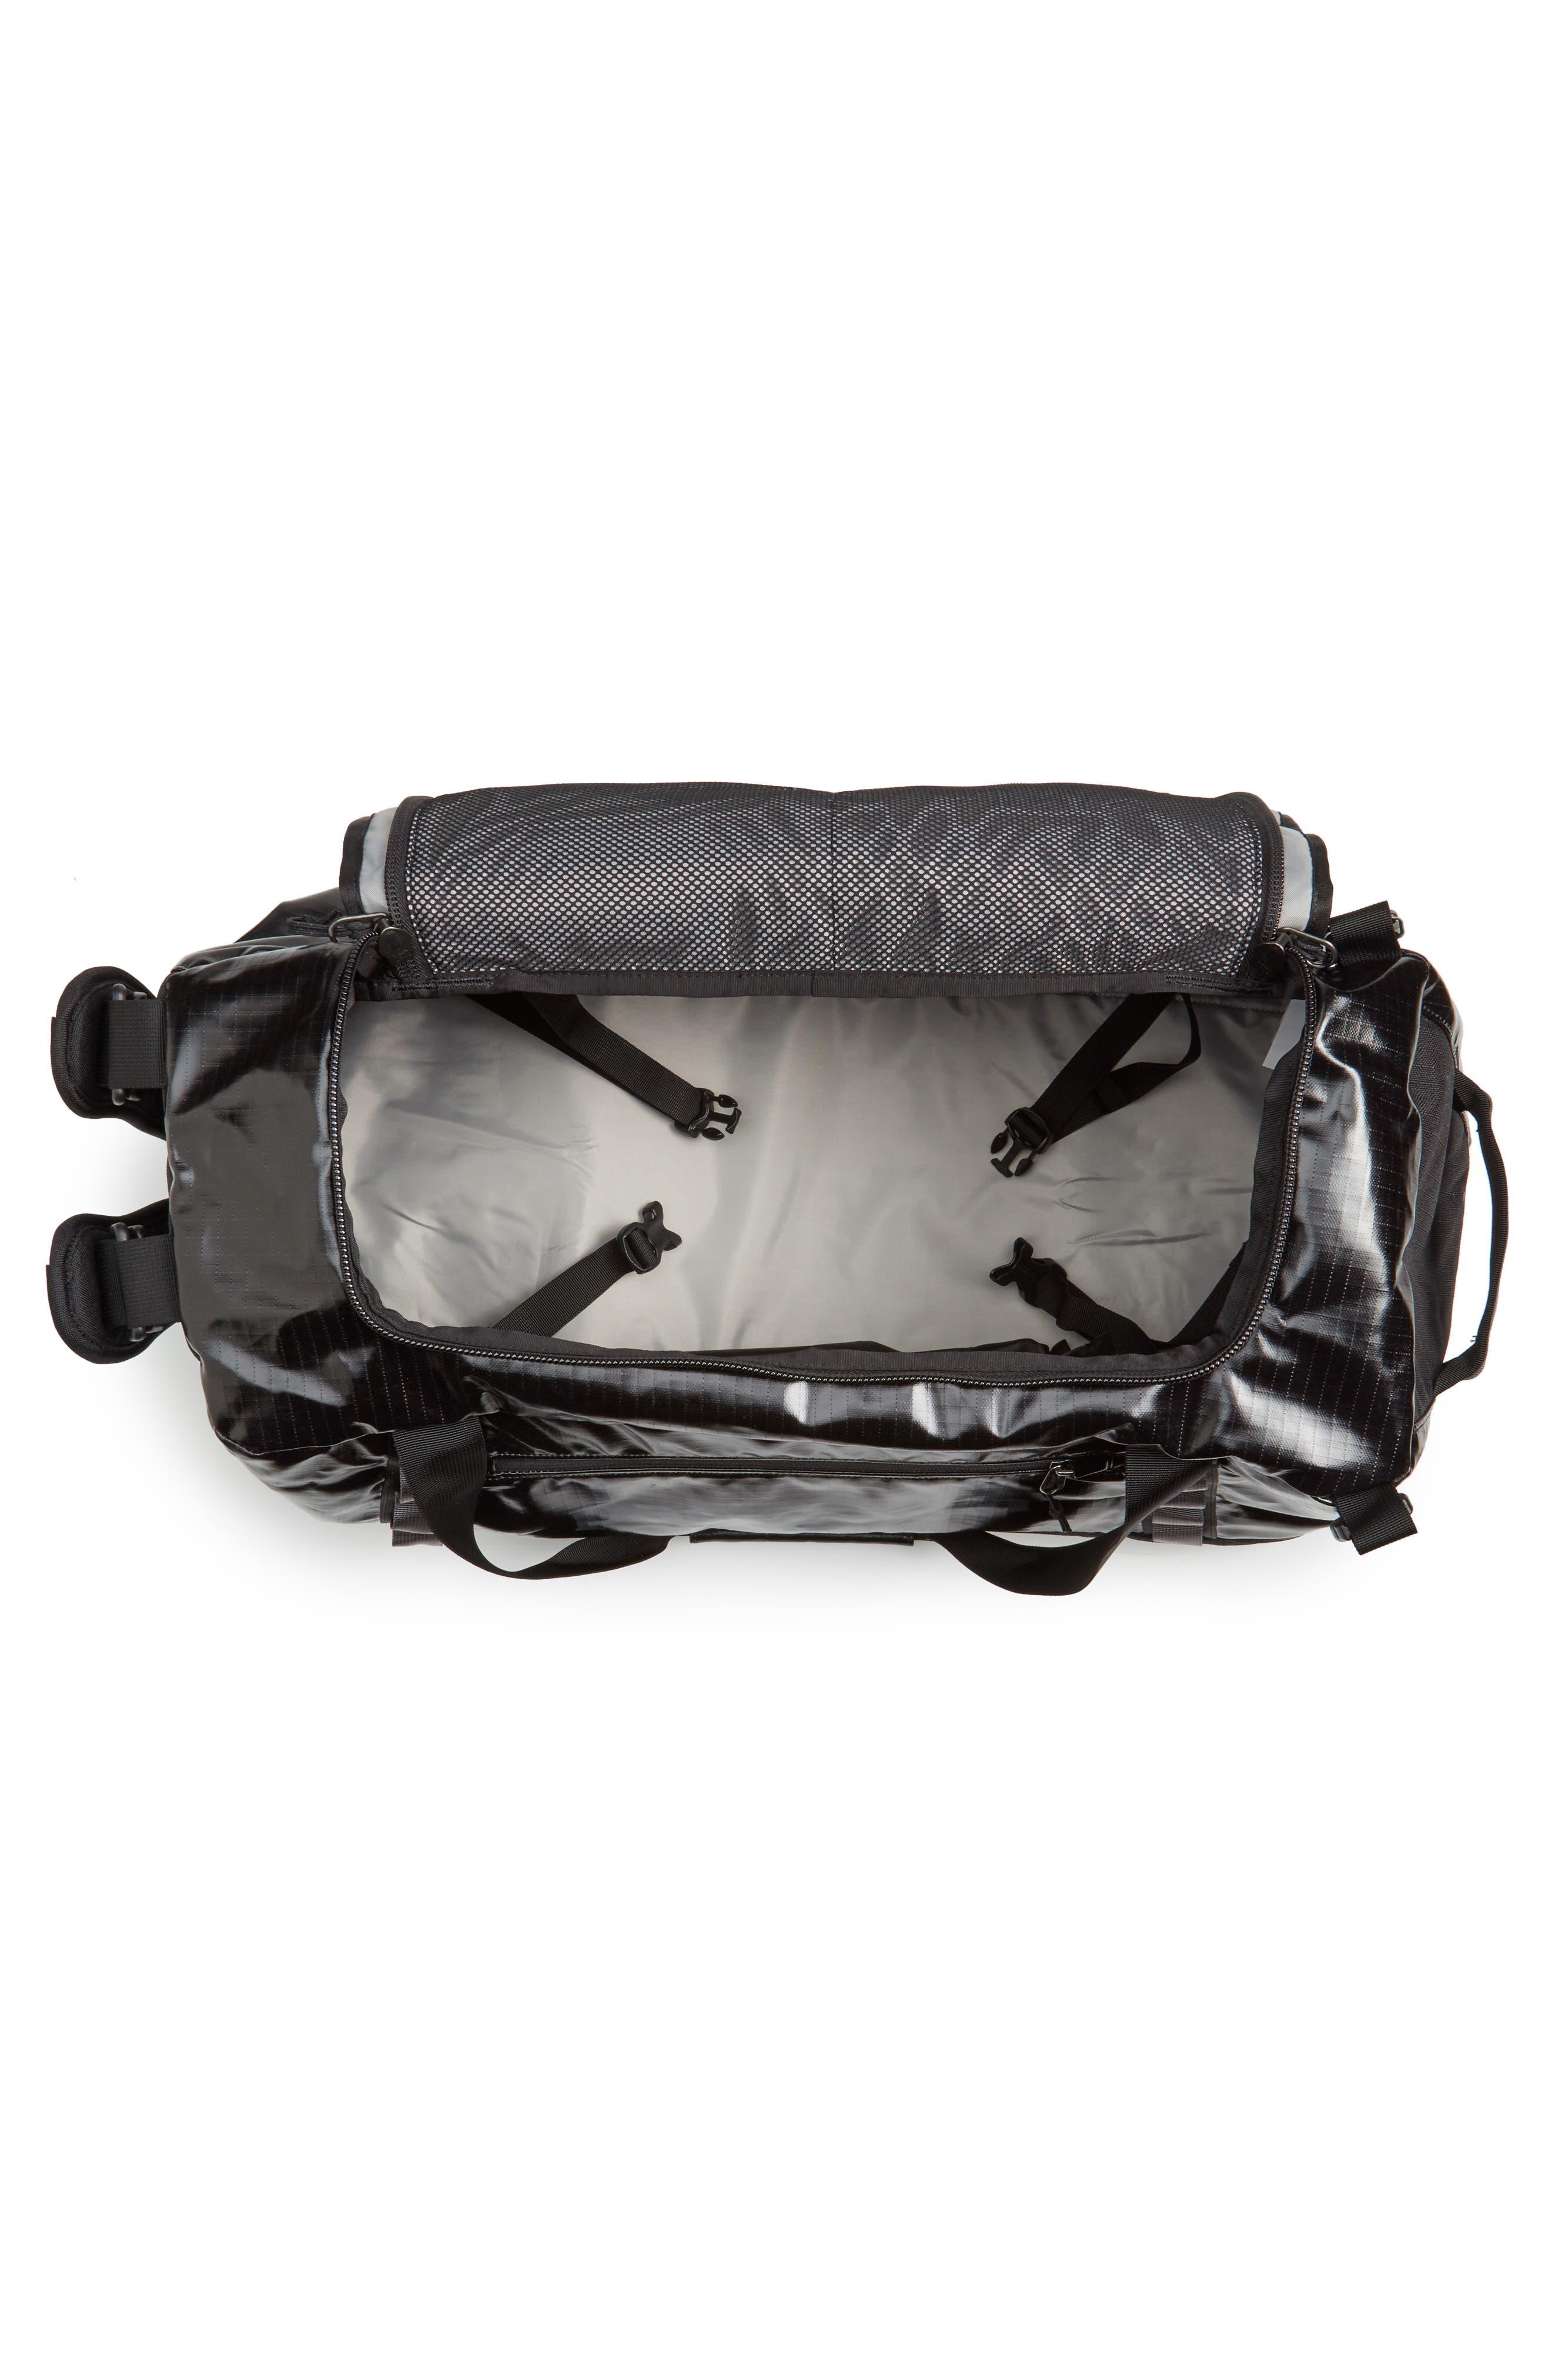 Black Hole Water Repellent Duffel Bag,                             Alternate thumbnail 4, color,                             Black